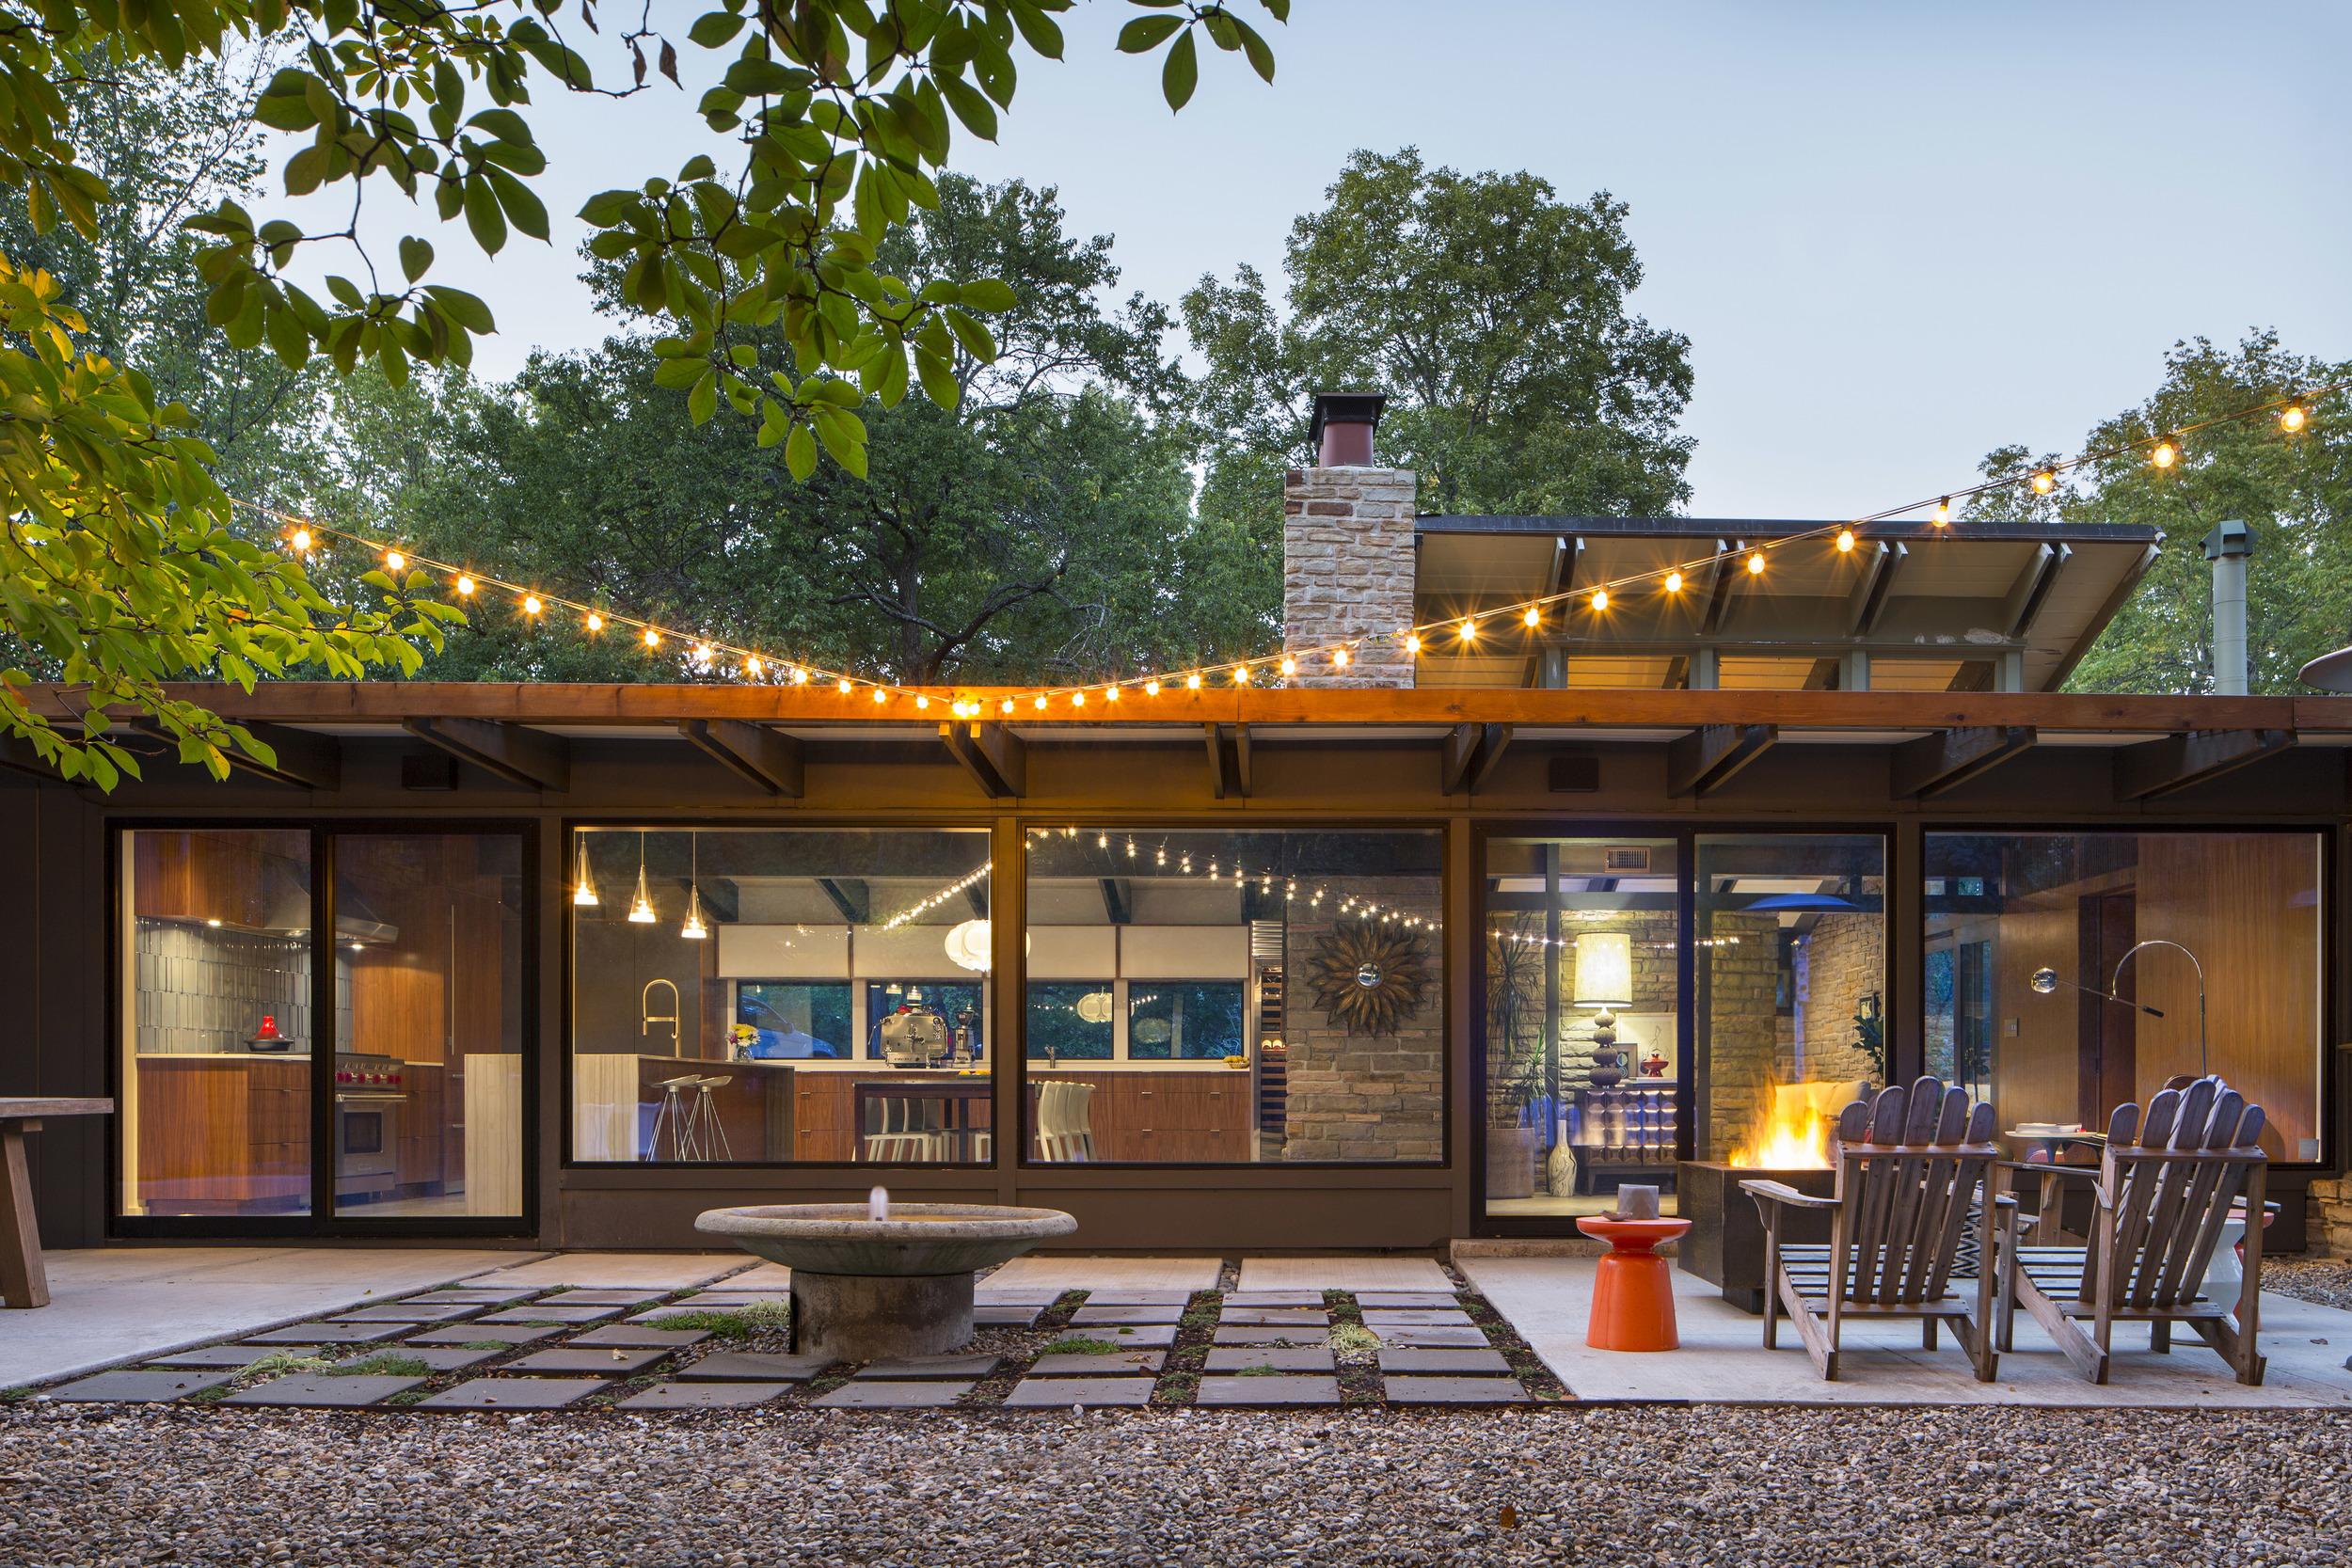 Stewart Williams Residence - Kansas City Missouri - Architect, David B. Runnells